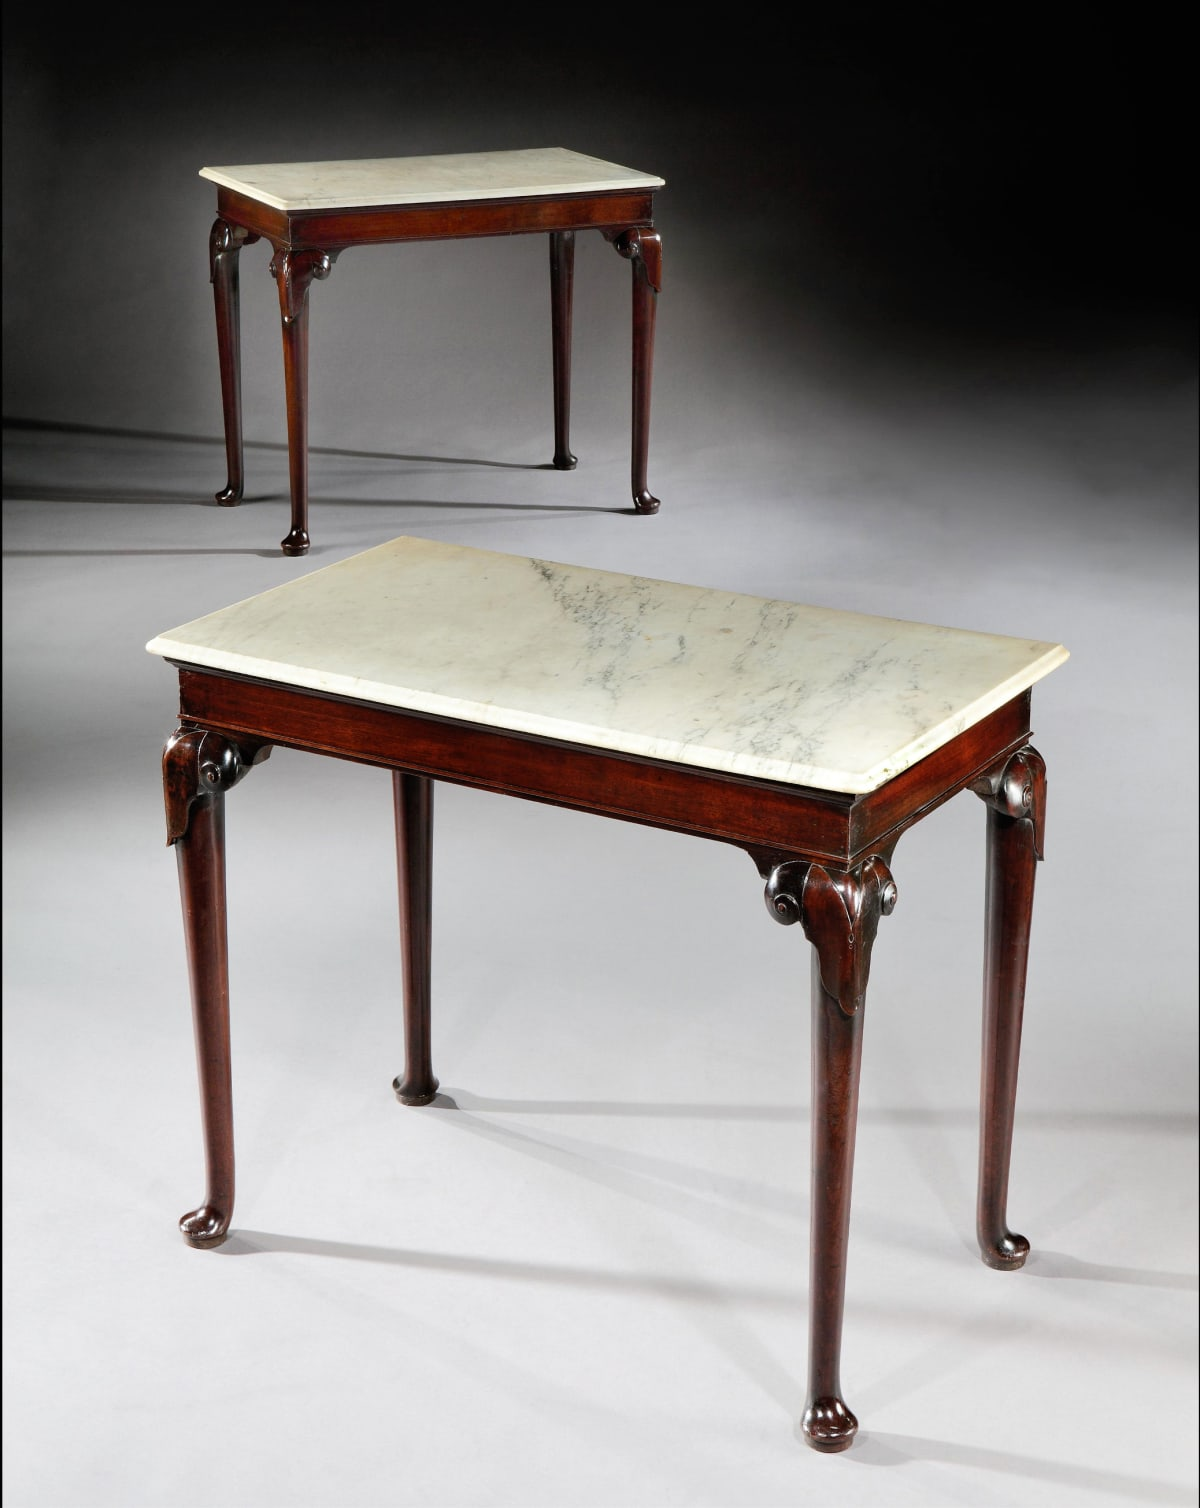 A PAIR OF GEROGE II MAHOGANY SIDE TABLES, English, circa 1765